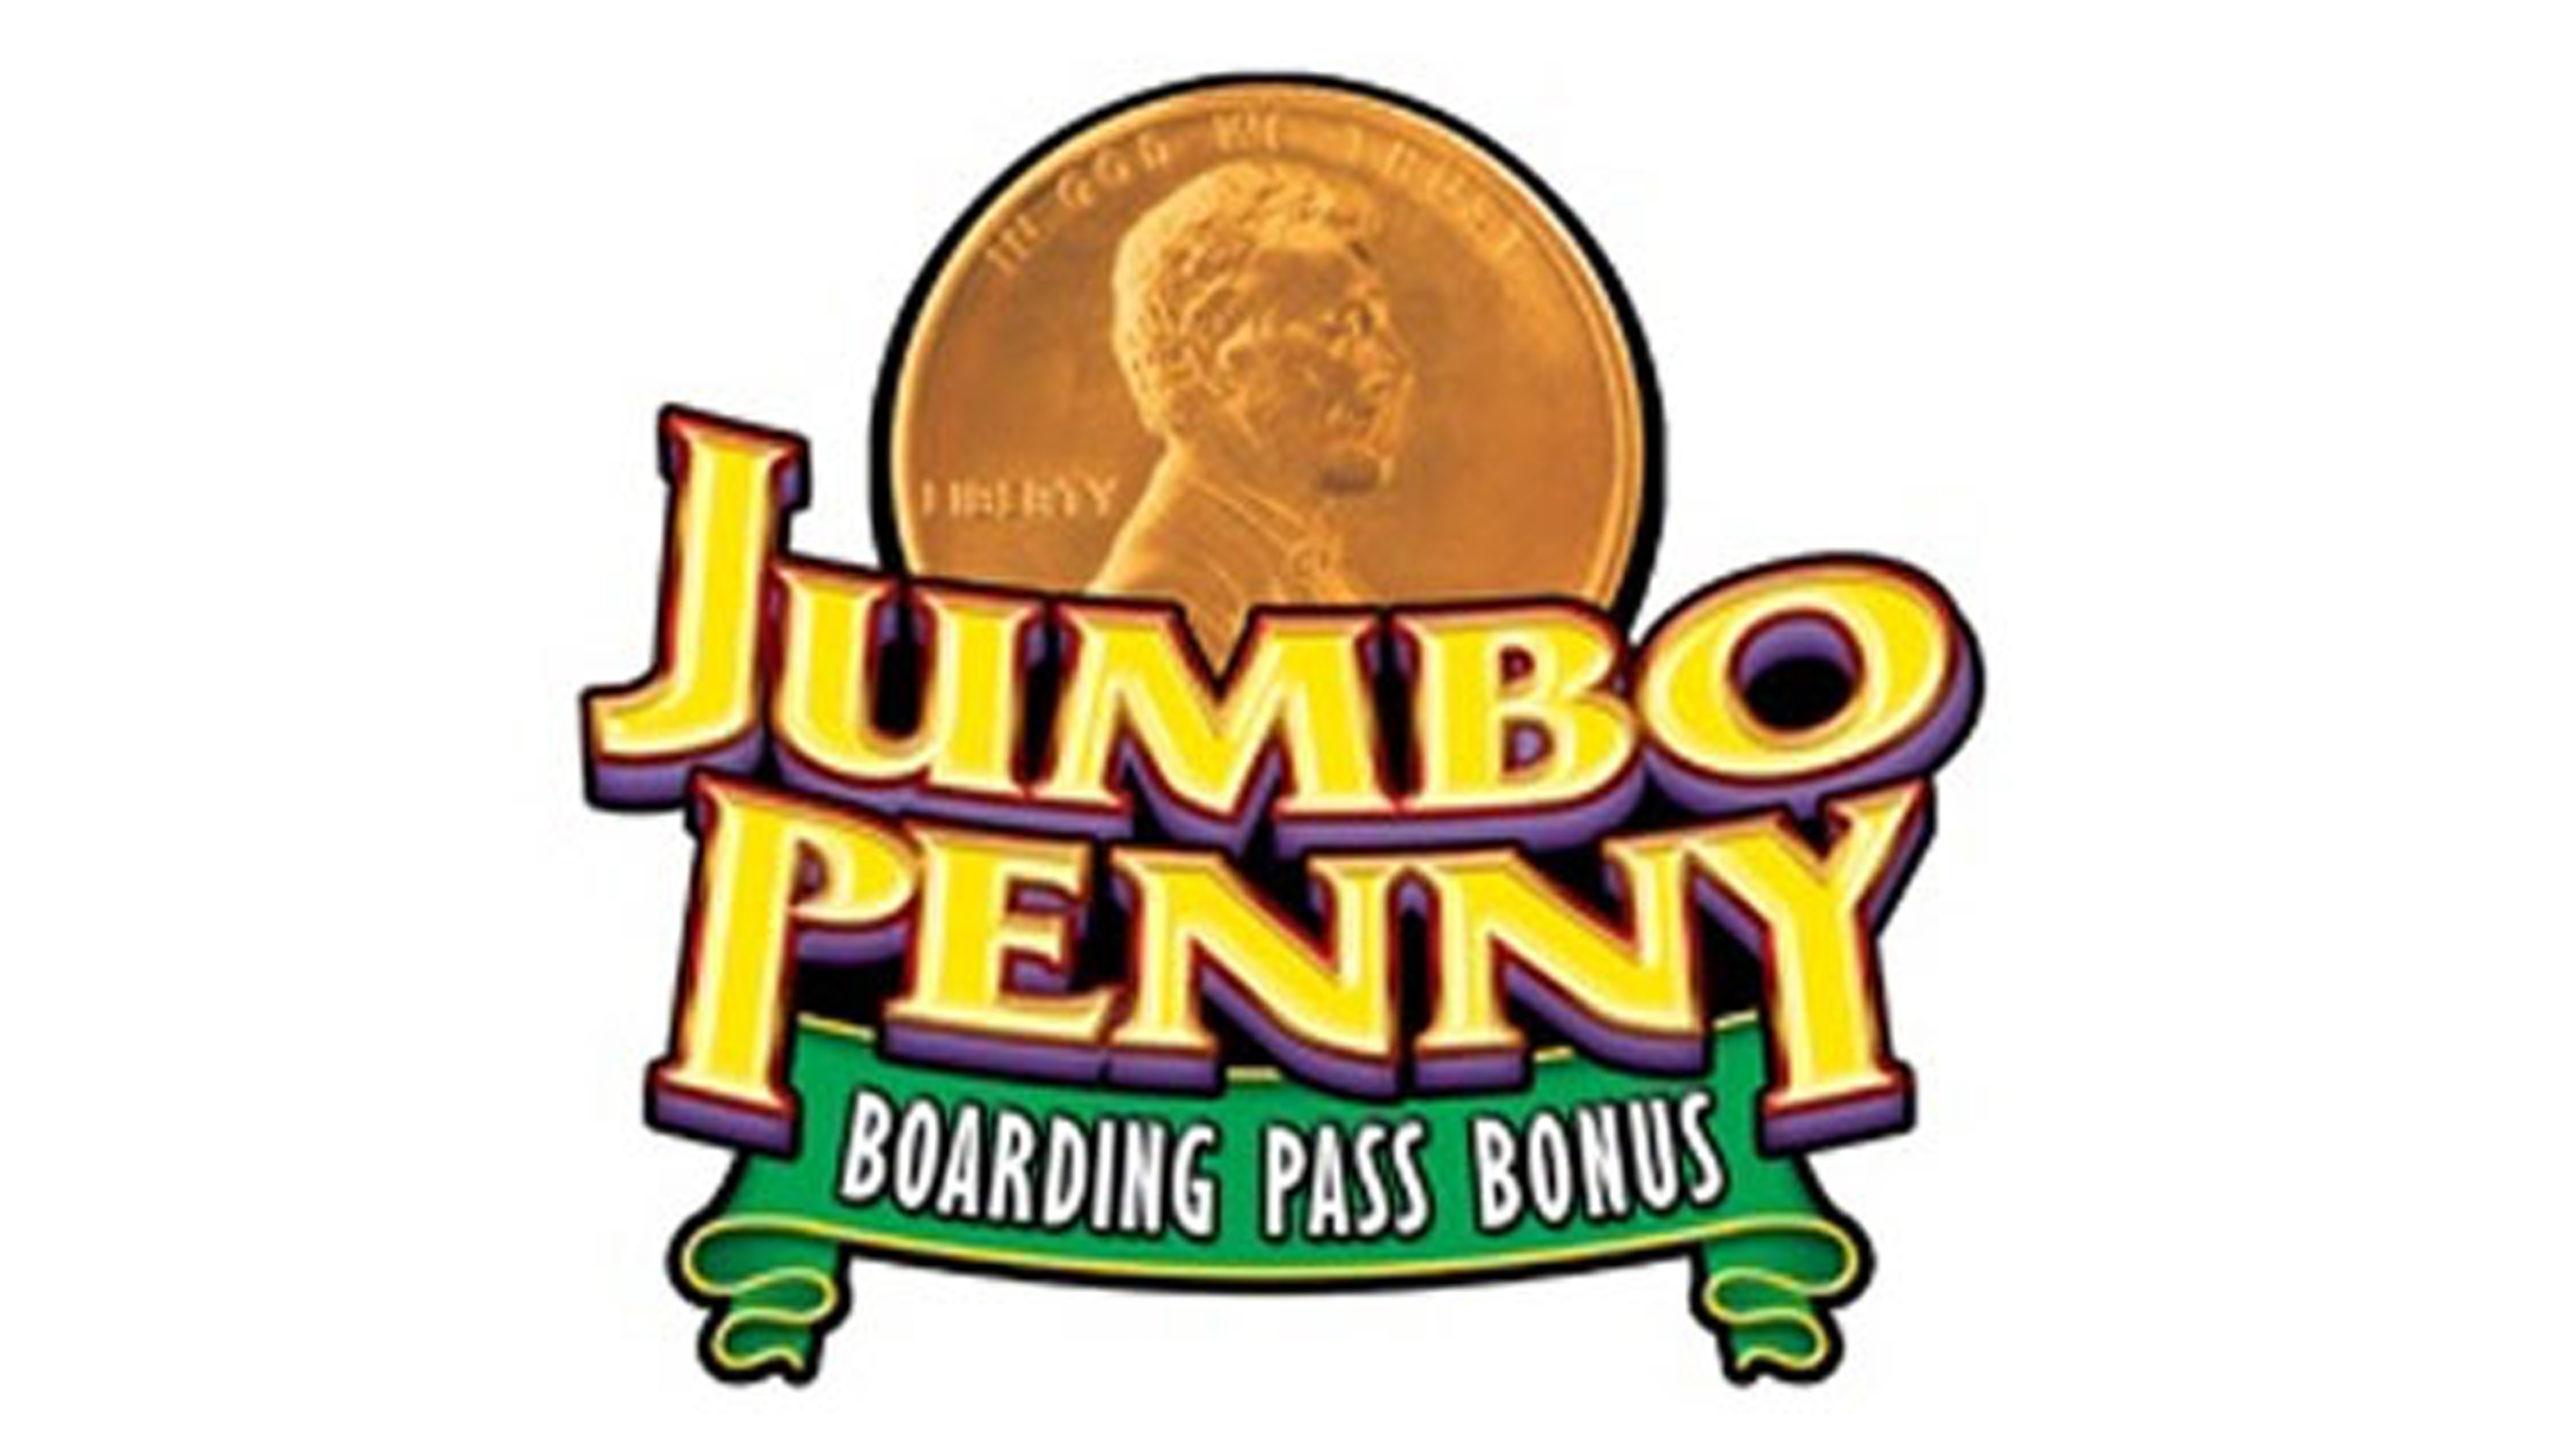 Jumbo Penny slot logo